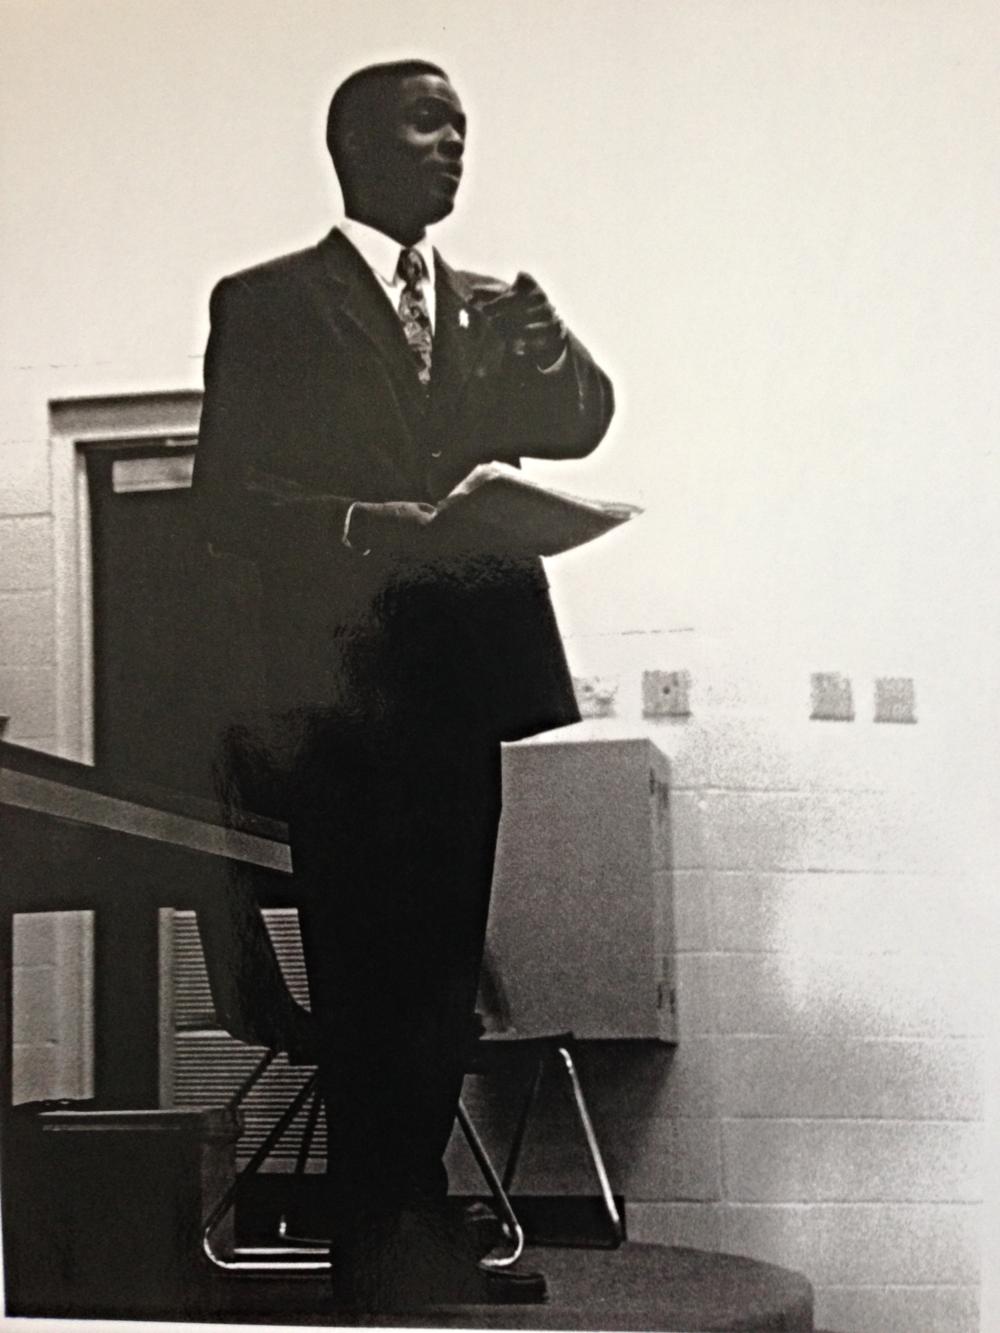 USF Student Body President, circa 1997